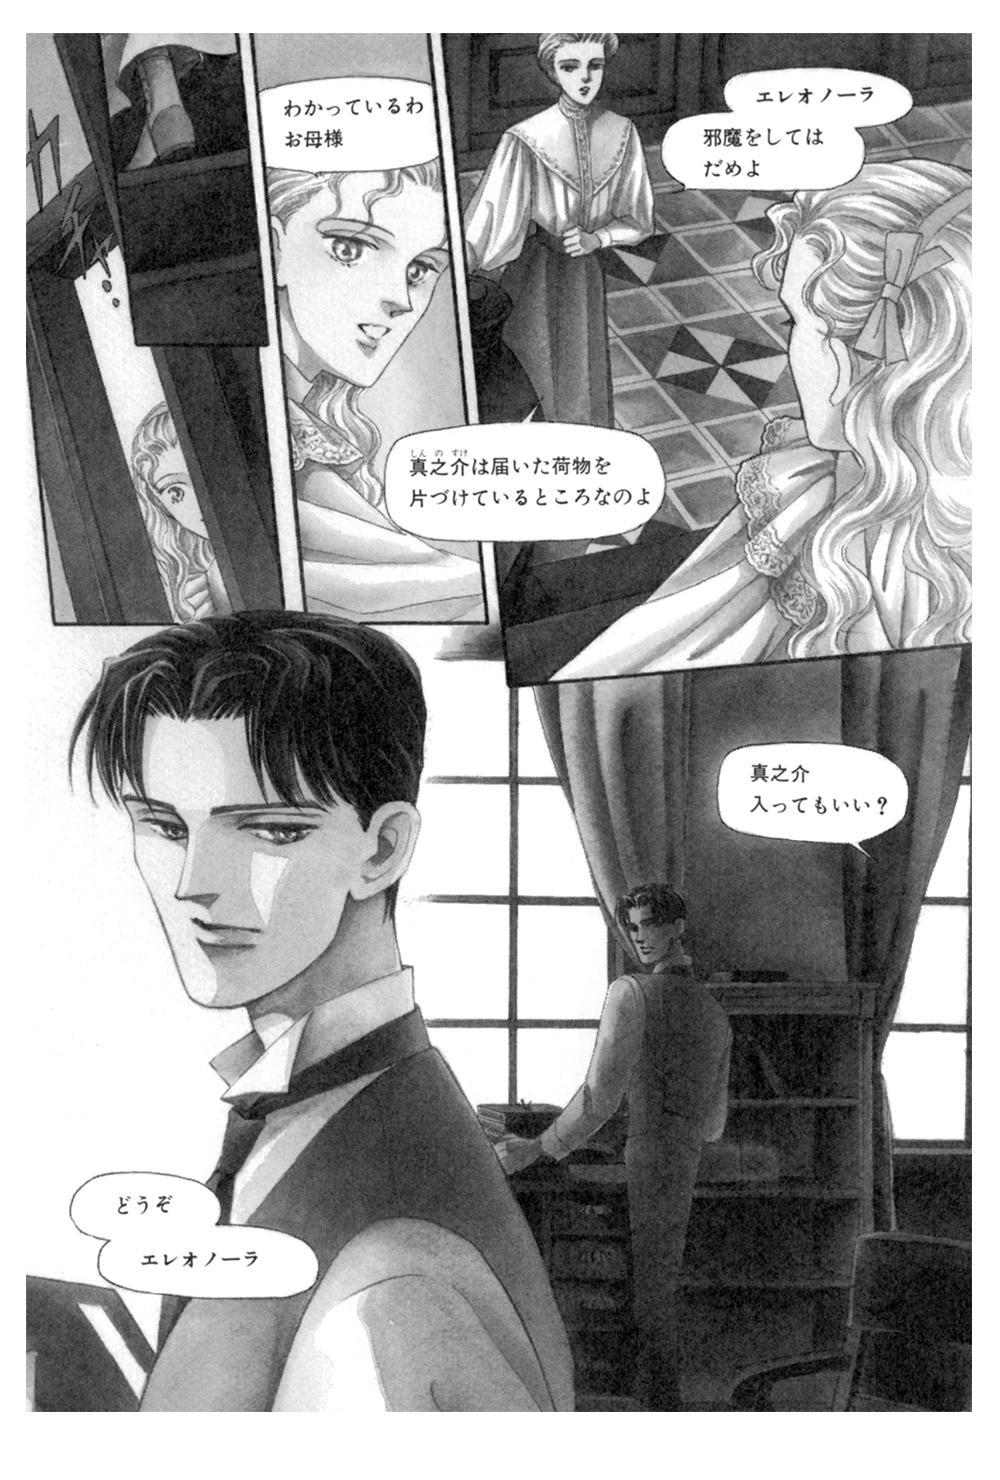 雨柳堂夢咄 第7話「金色の鶏」①uryudo-04-161.jpg